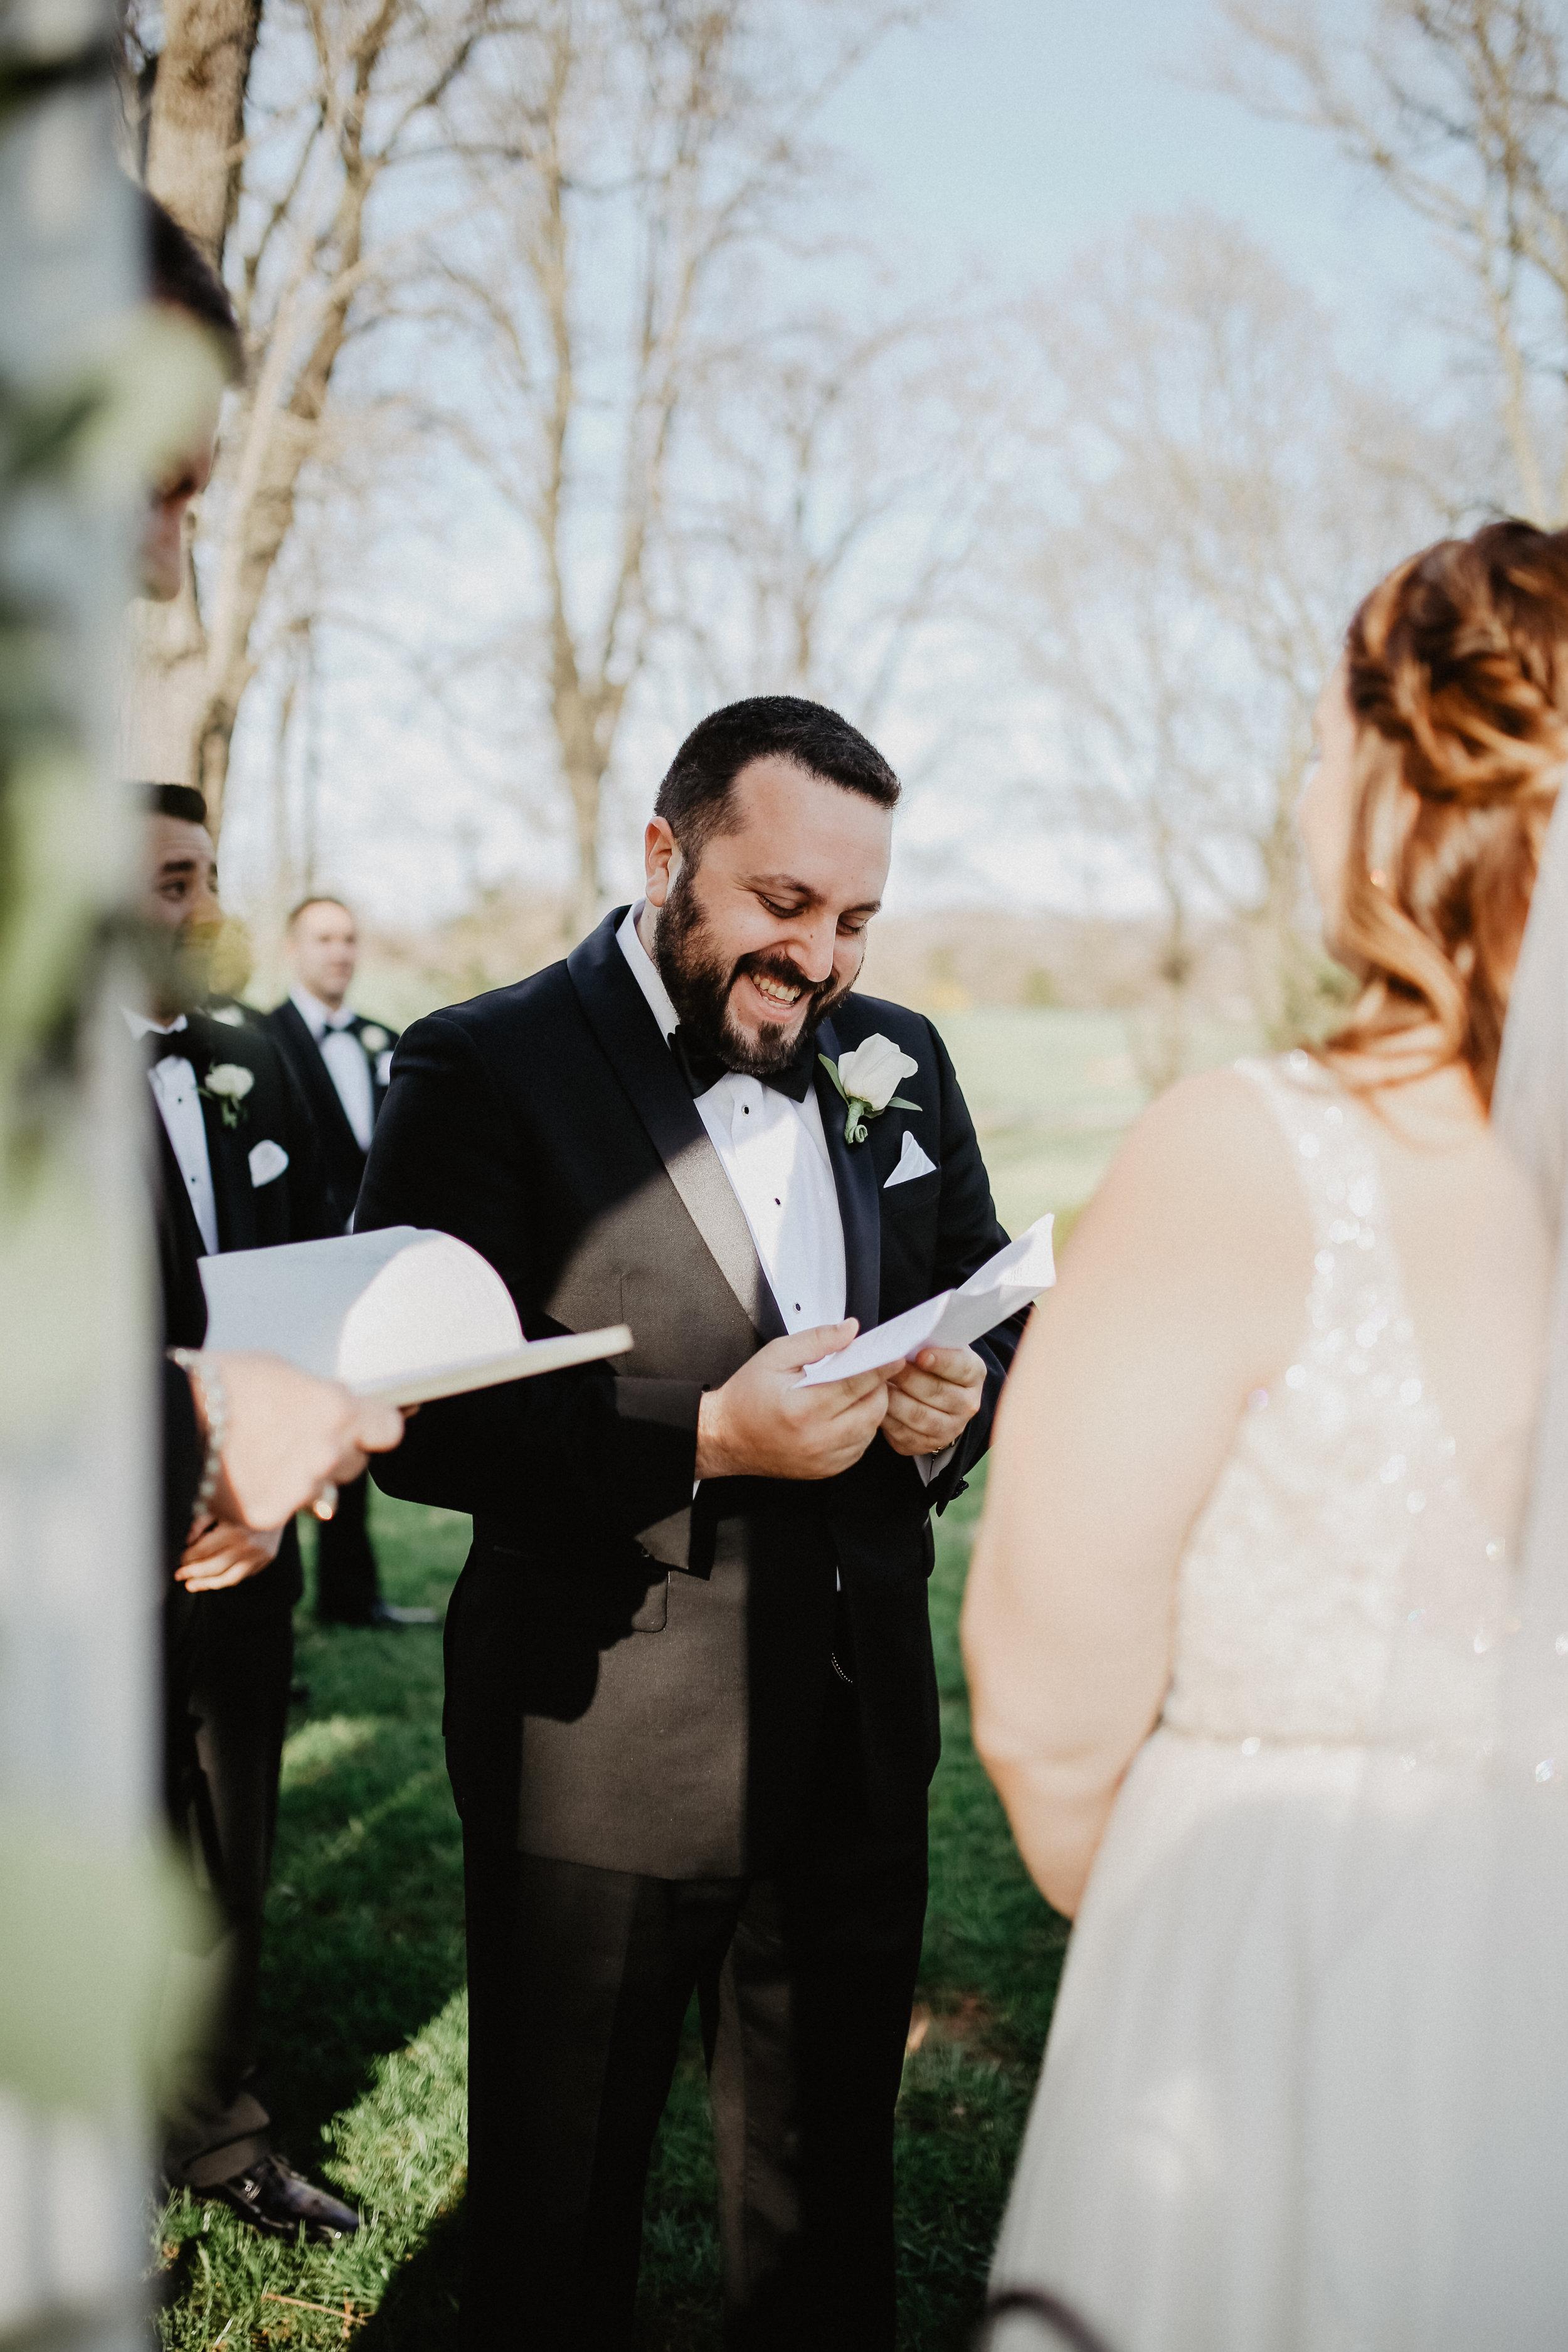 AnthonyKyndra_Married_2018-306.jpg